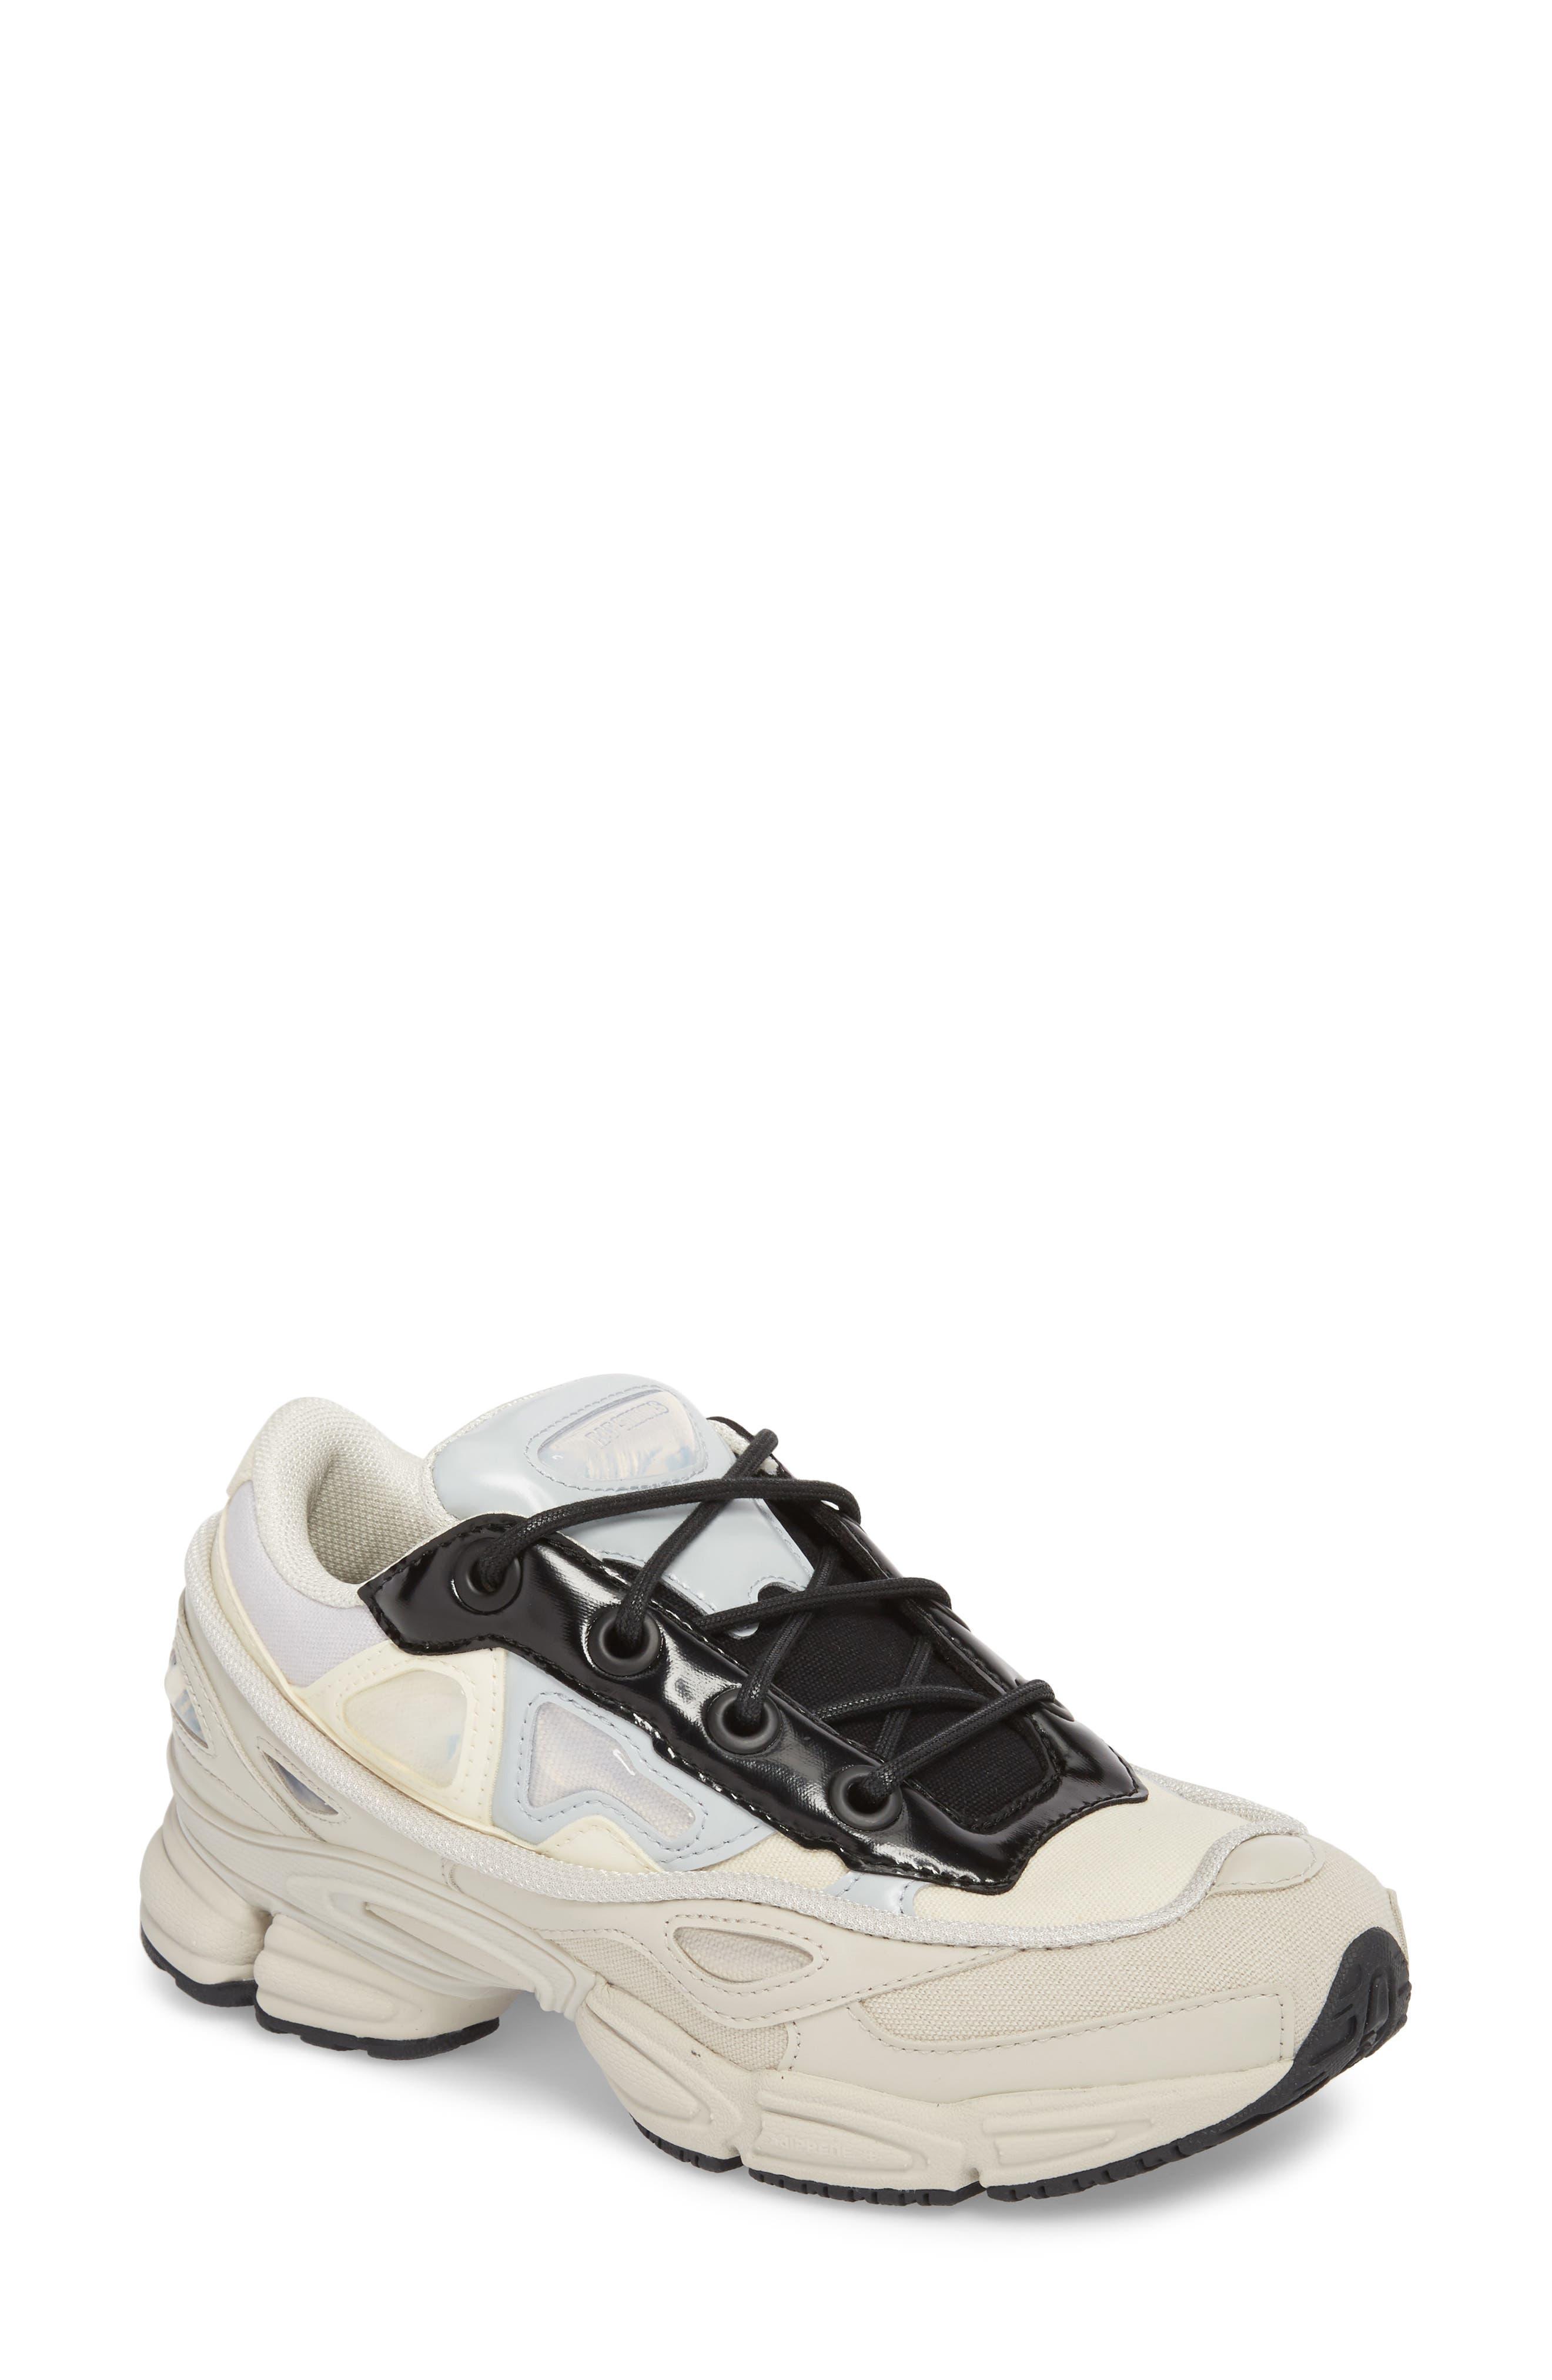 adidas by Raf Simons Ozweego III Sneaker,                         Main,                         color, 150